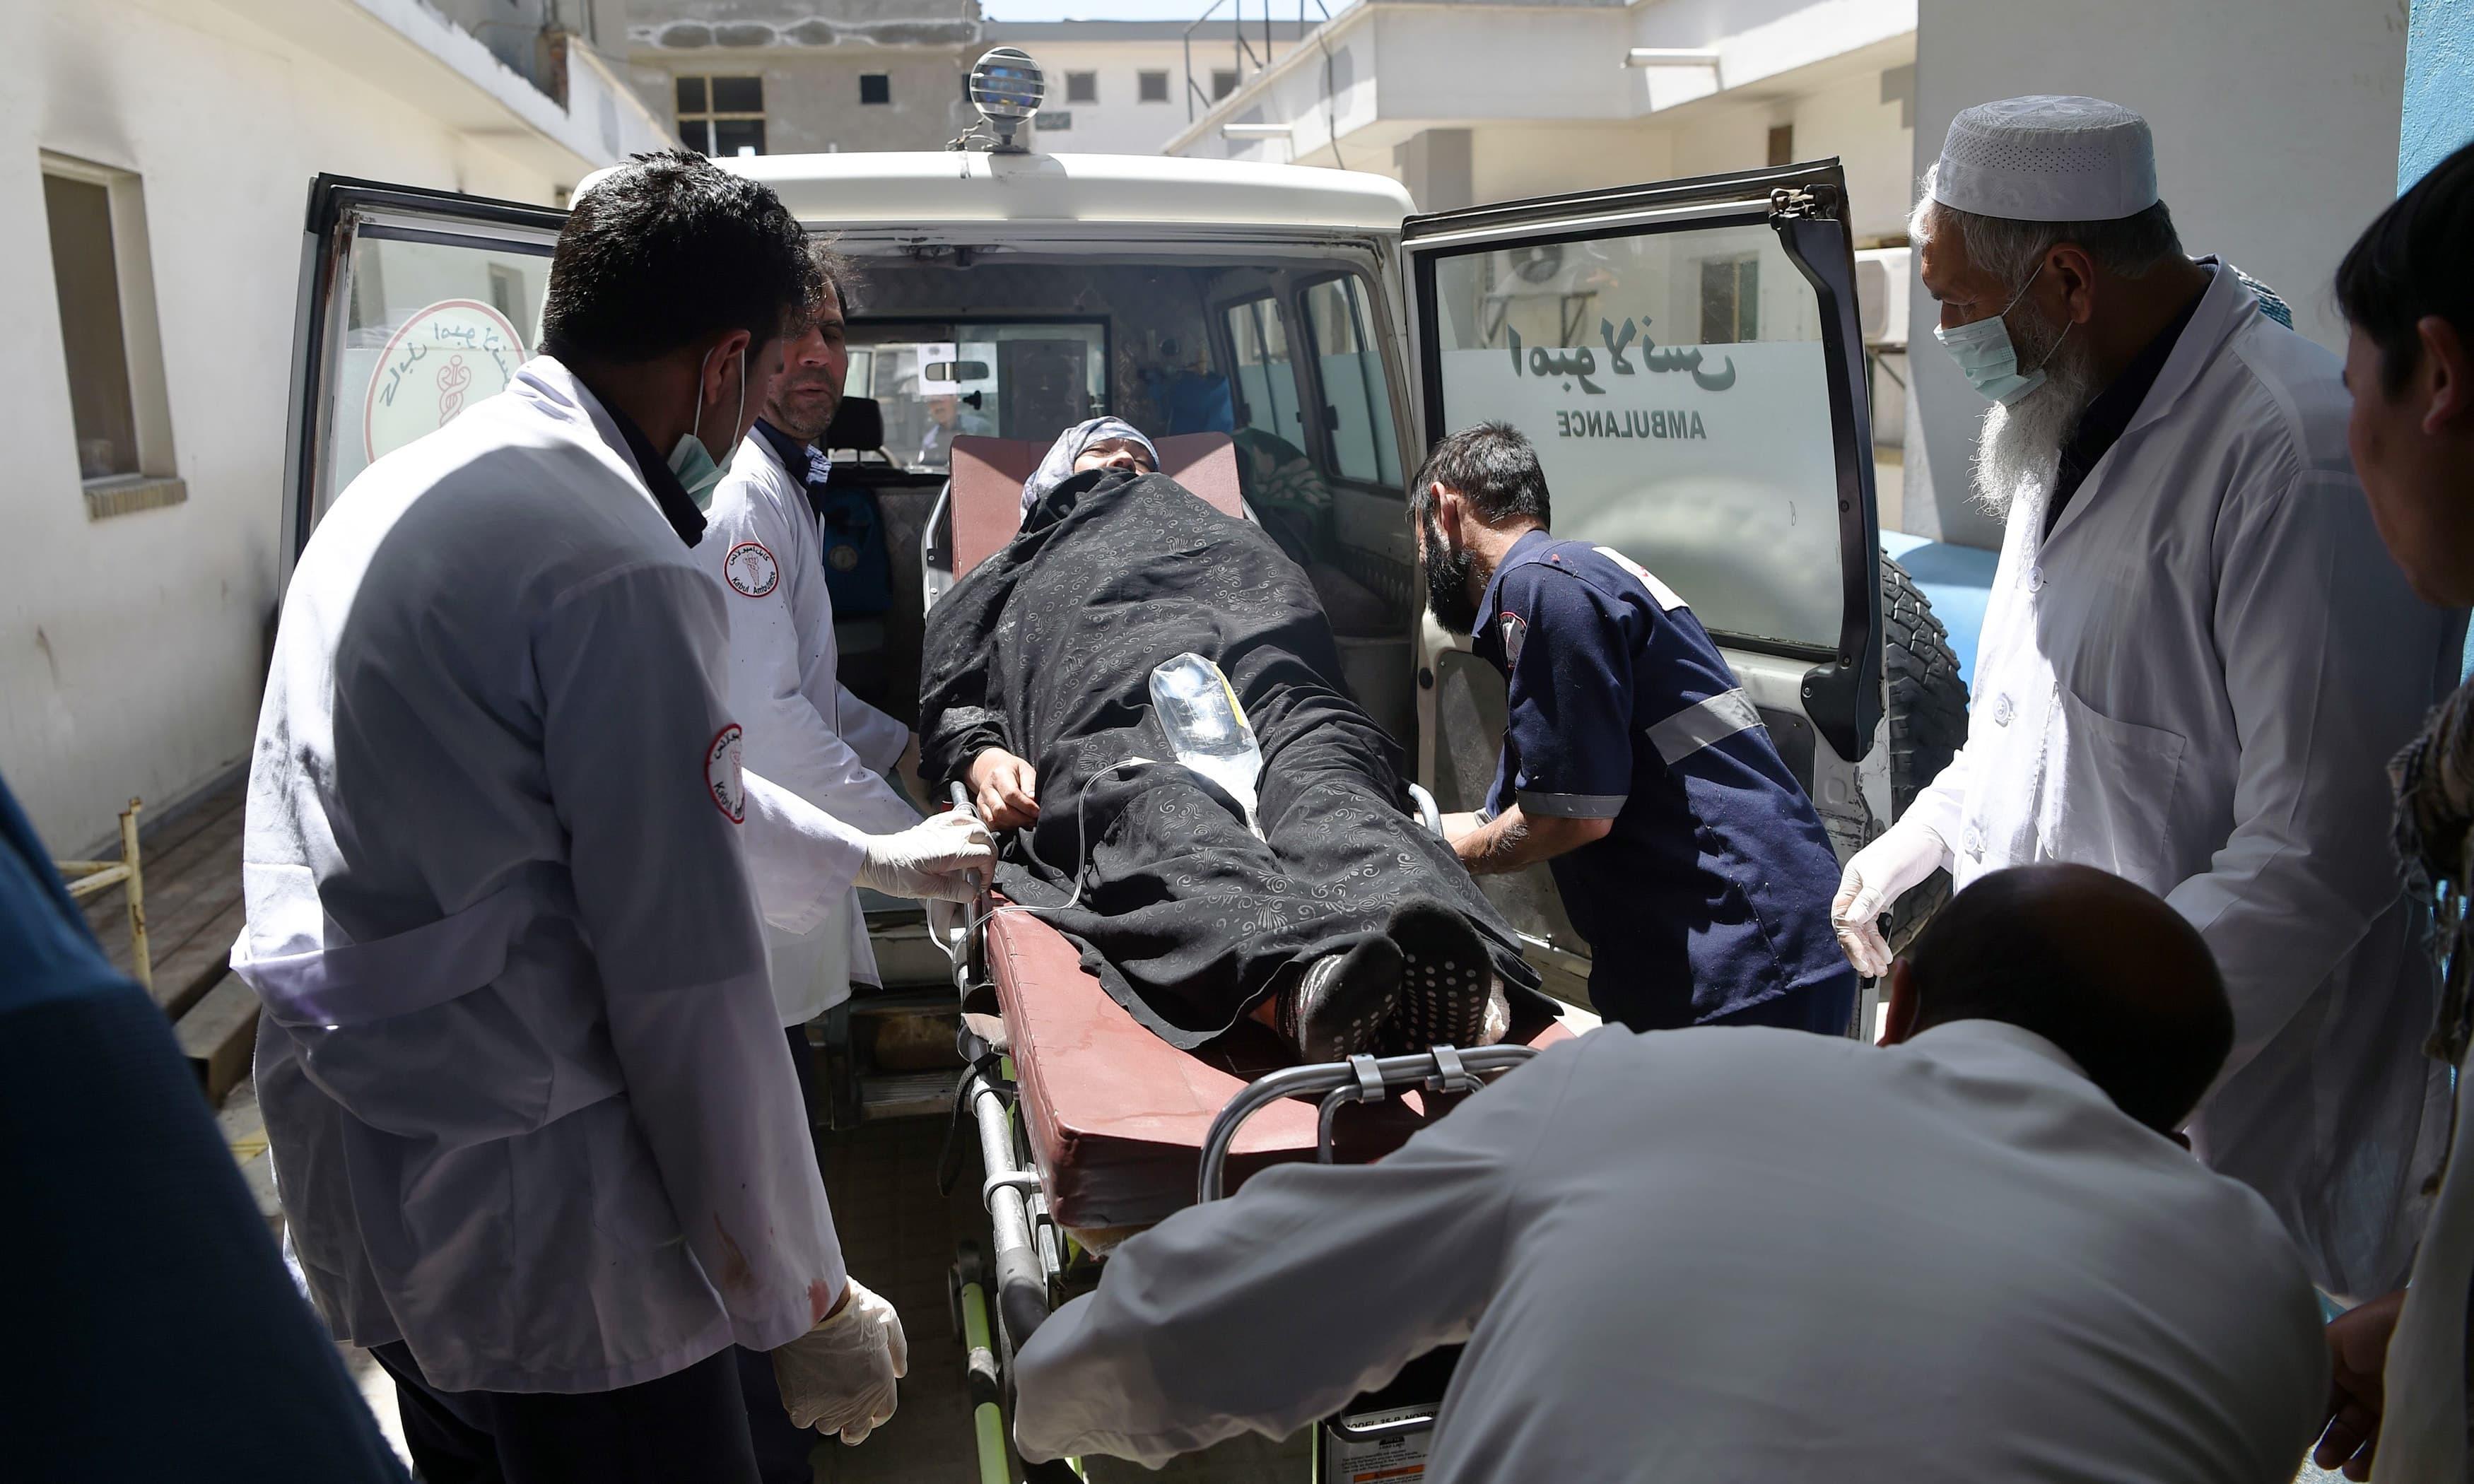 Mortar blast at Afghan madressah kills 9 students